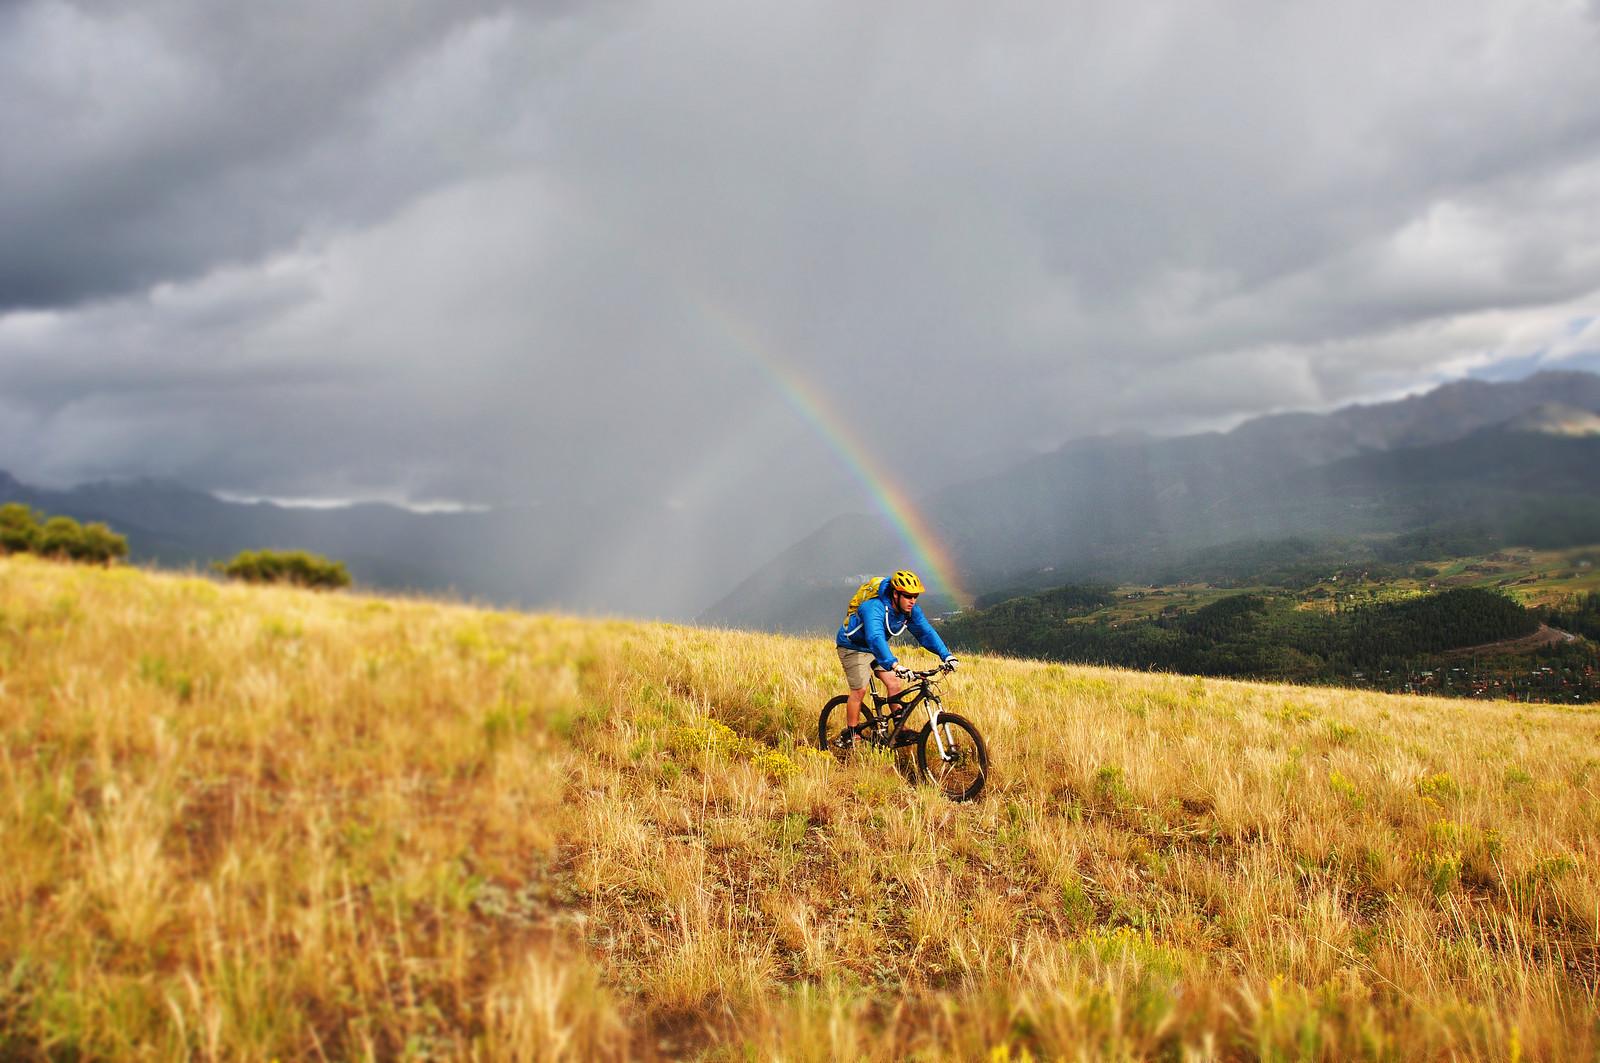 Person on bike through a field